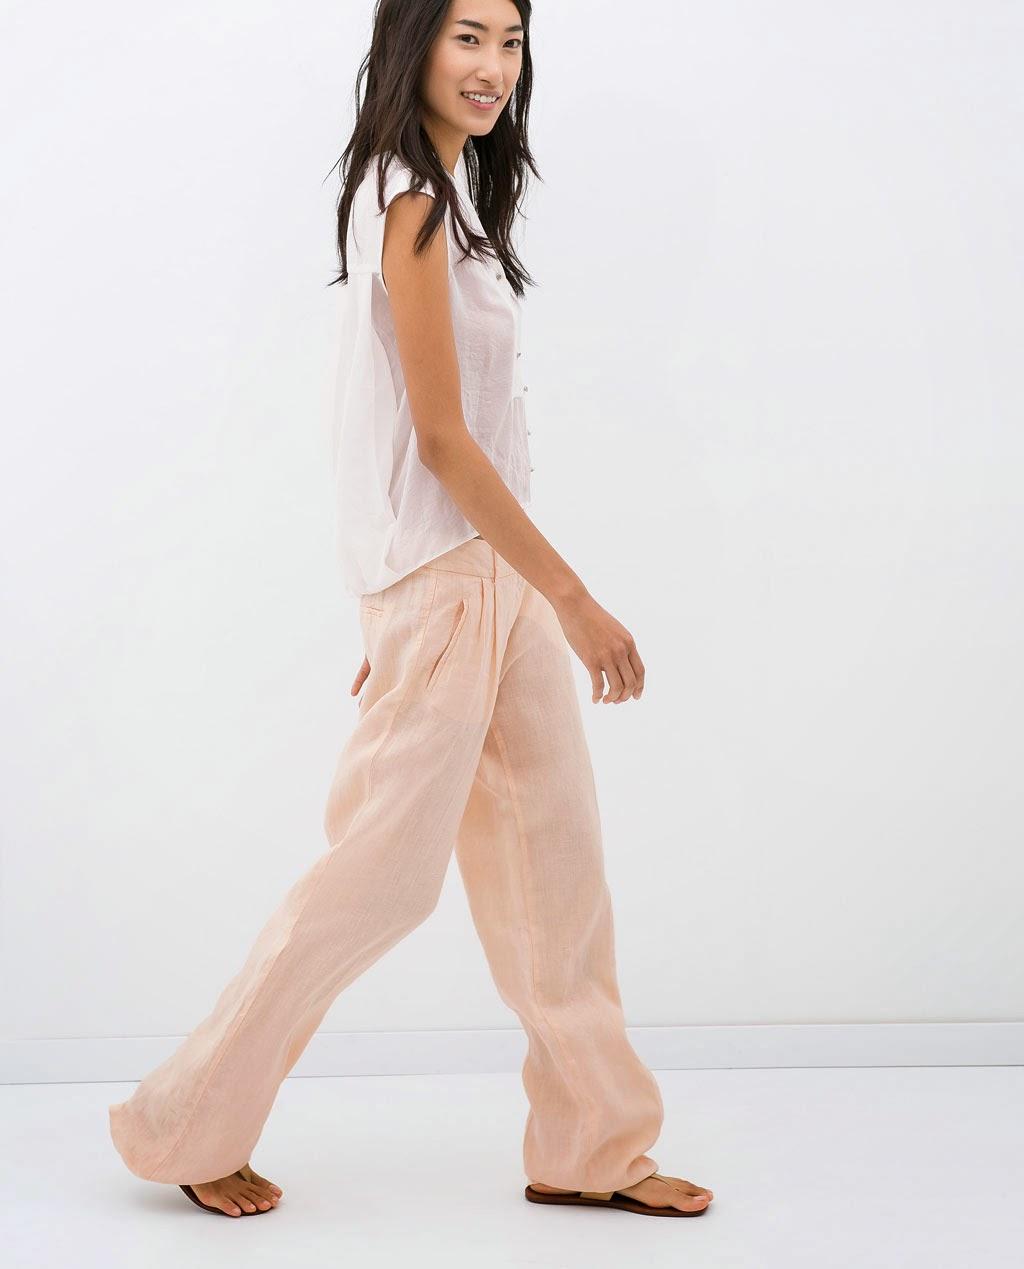 Pantalón pinzas, Zara, Rosa, Pink, Style, Fashion, Street Style